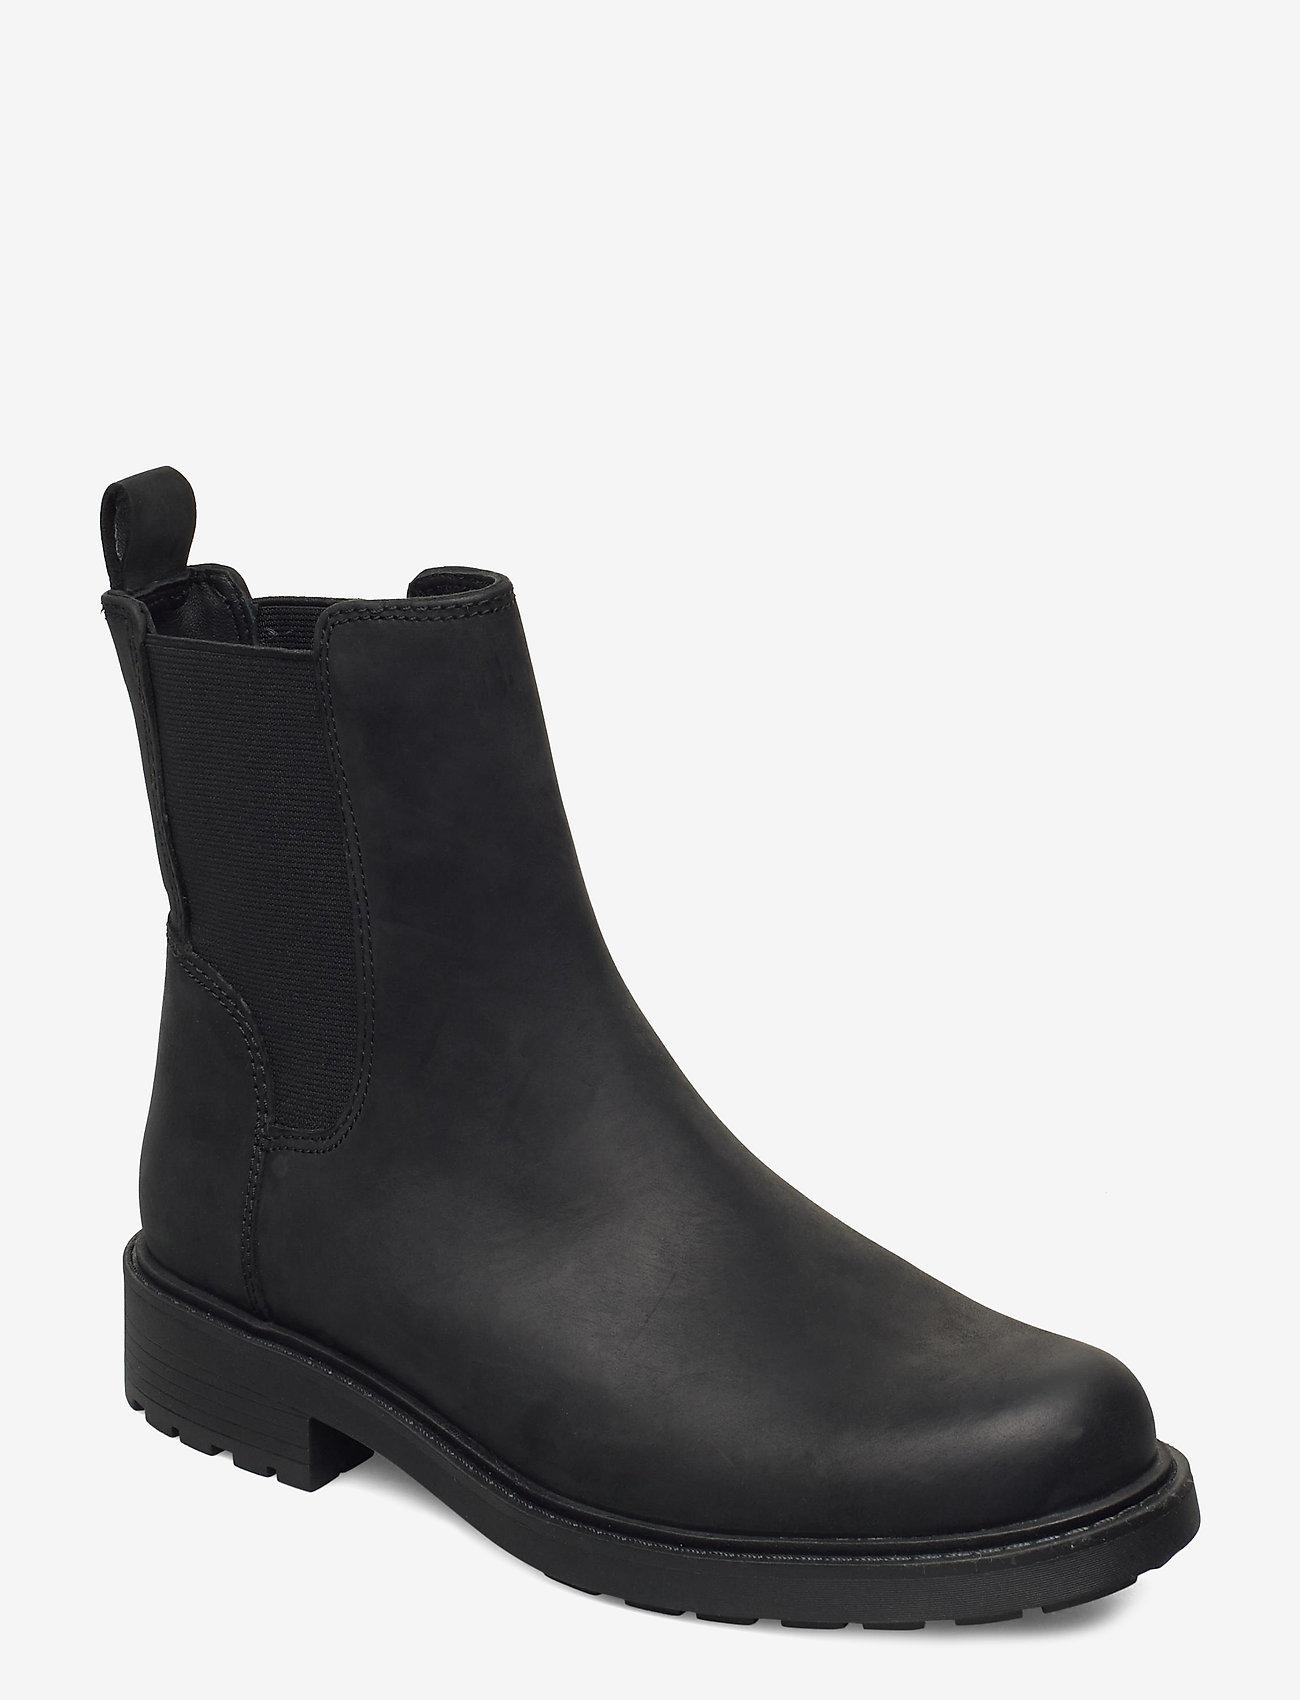 Clarks - Orinoco2 Top - chelsea boots - black leather - 0